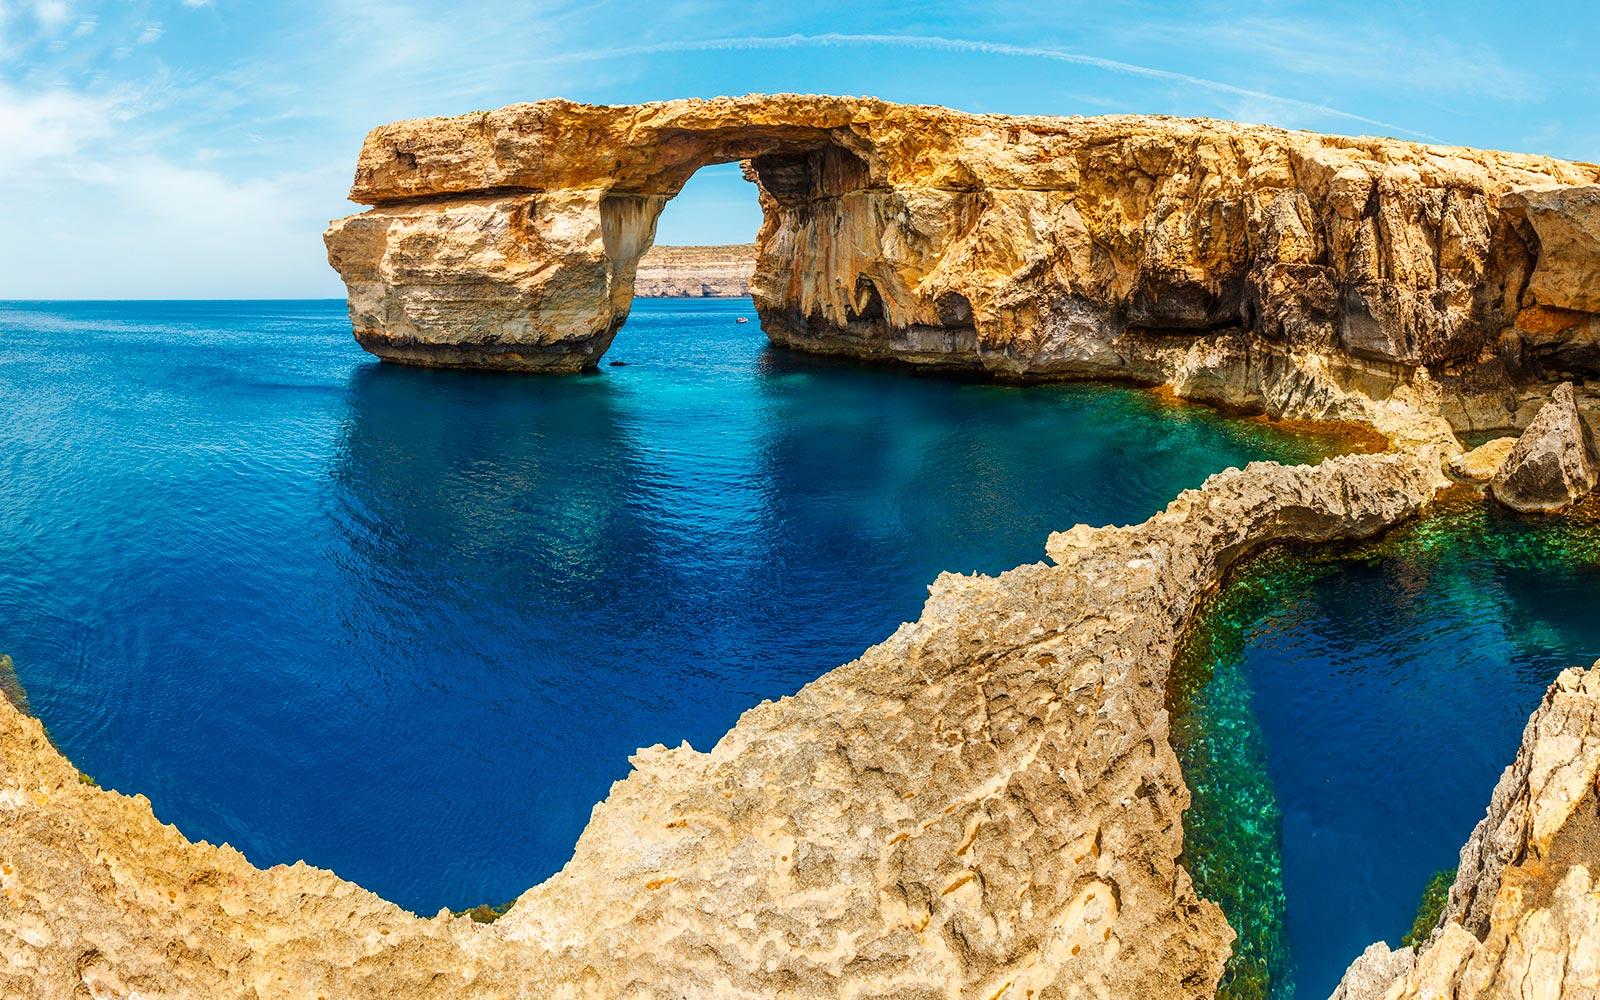 malta-gozo-a-comino-raj-v-srdci-stredoze-secret-world